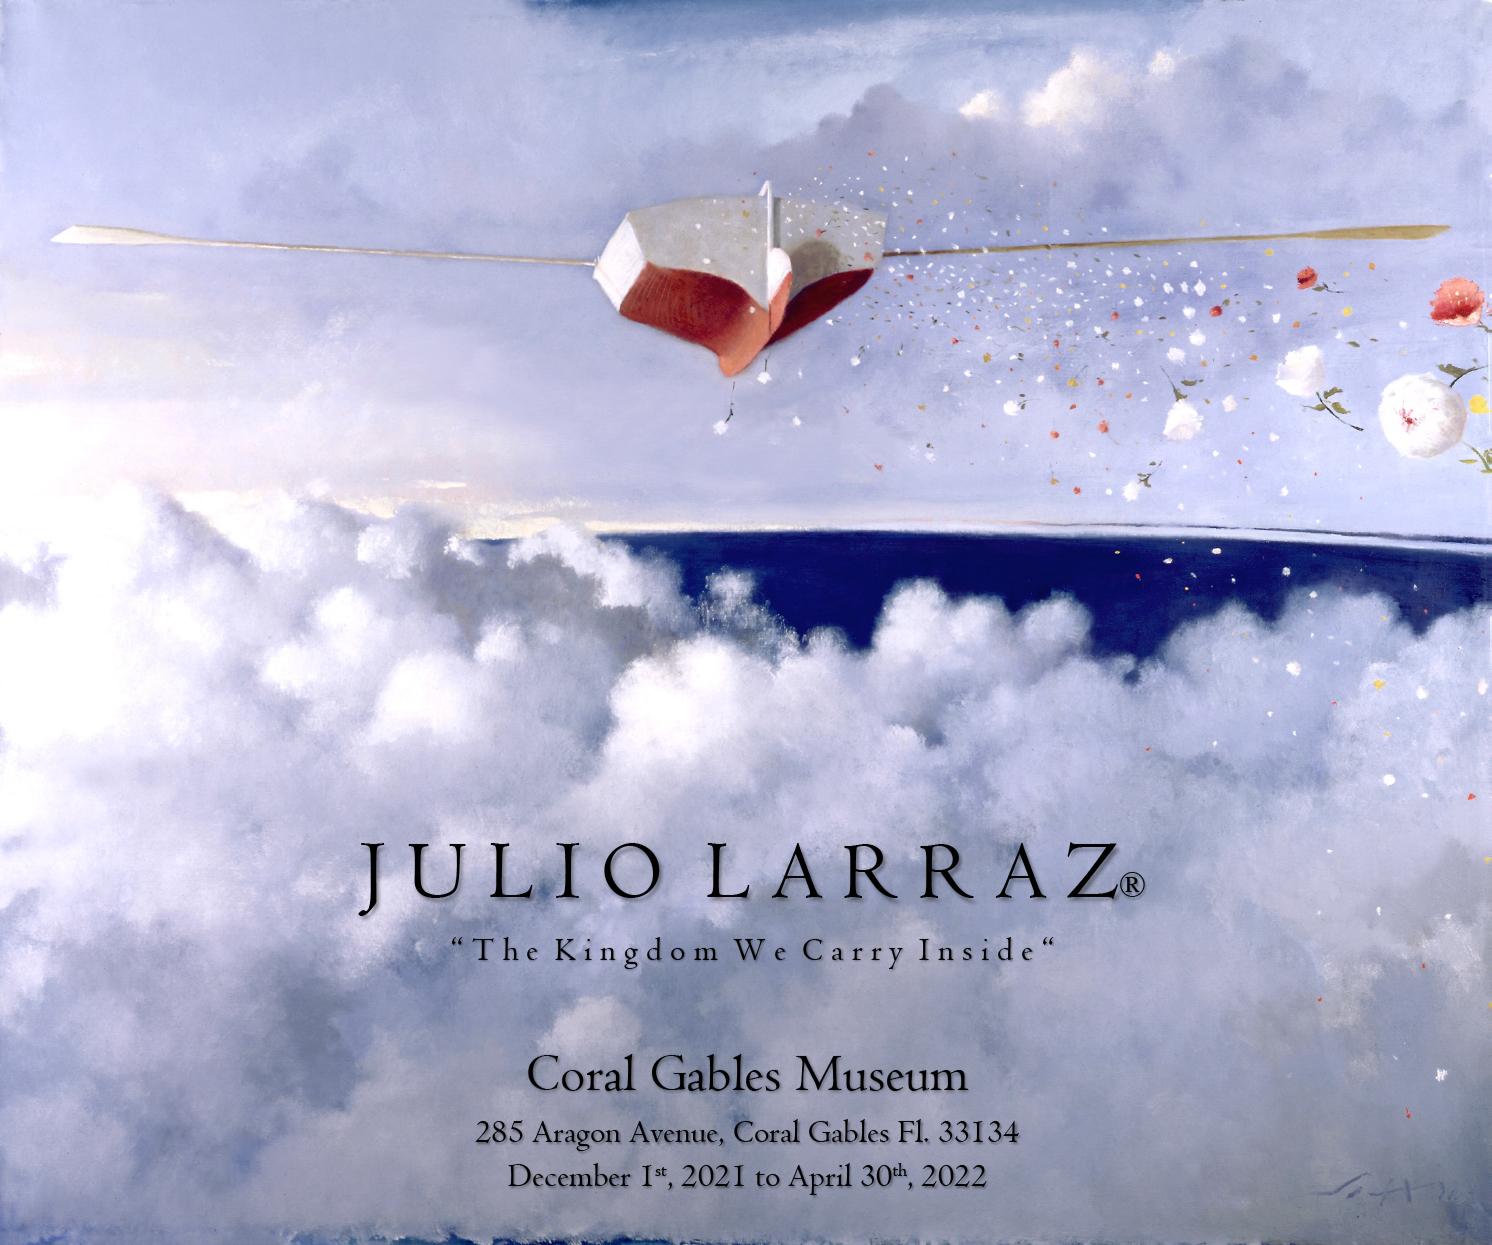 Julio Larraz Coral Gables Museum